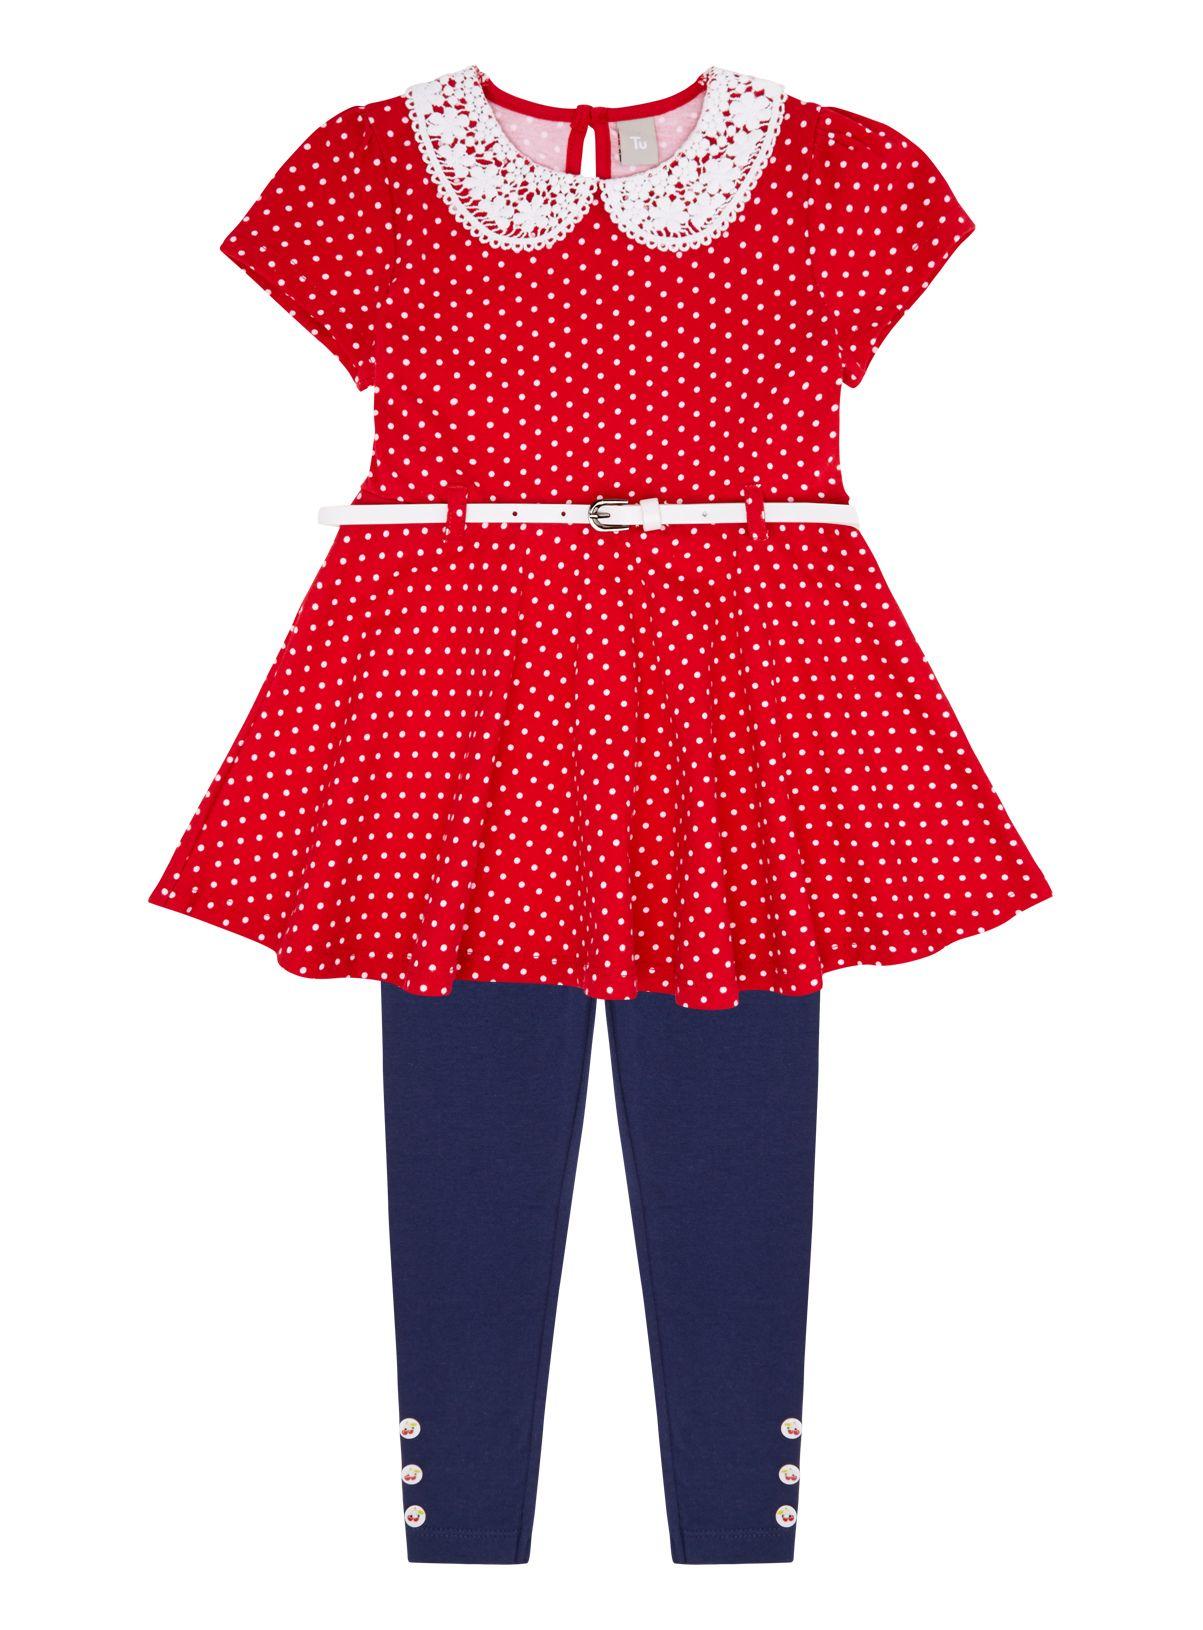 White apron sainsburys - 3 12 Years Tu At Sainsburys Girls Red Spotted Jersey Dress 10